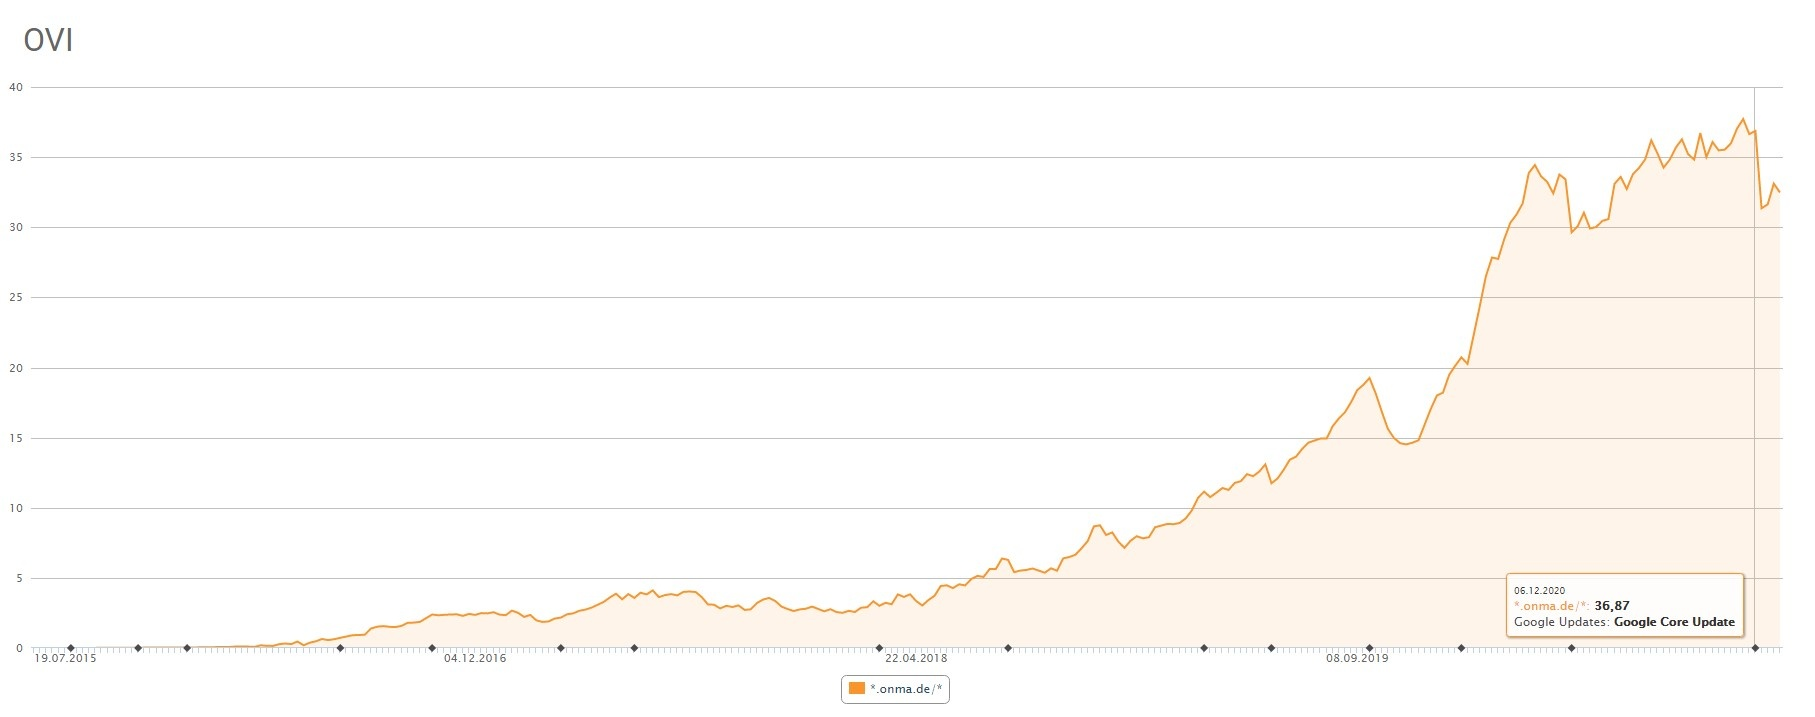 xovi online value index ovi onma de